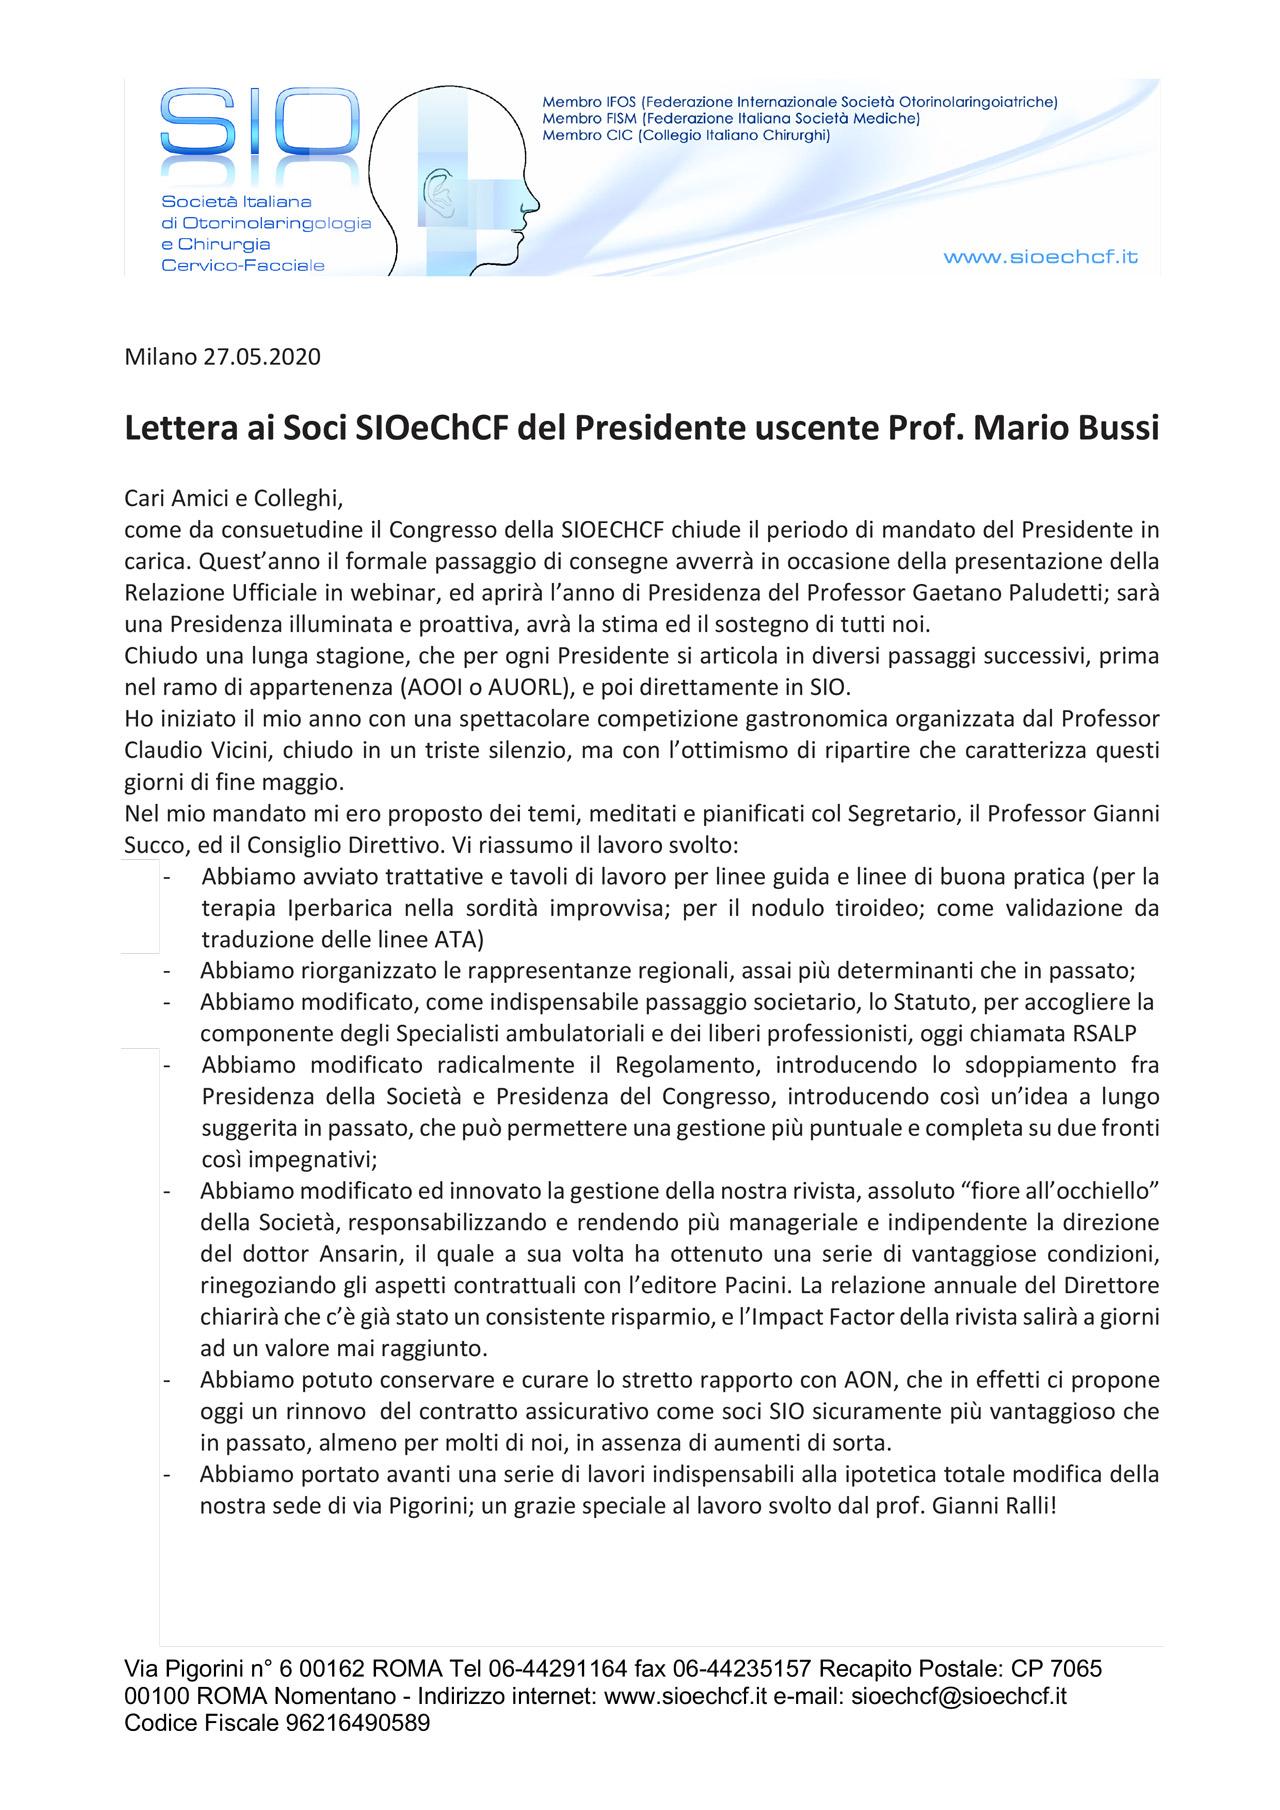 Lettera-Prof-MarioBussi-ai-Soci-2020-1